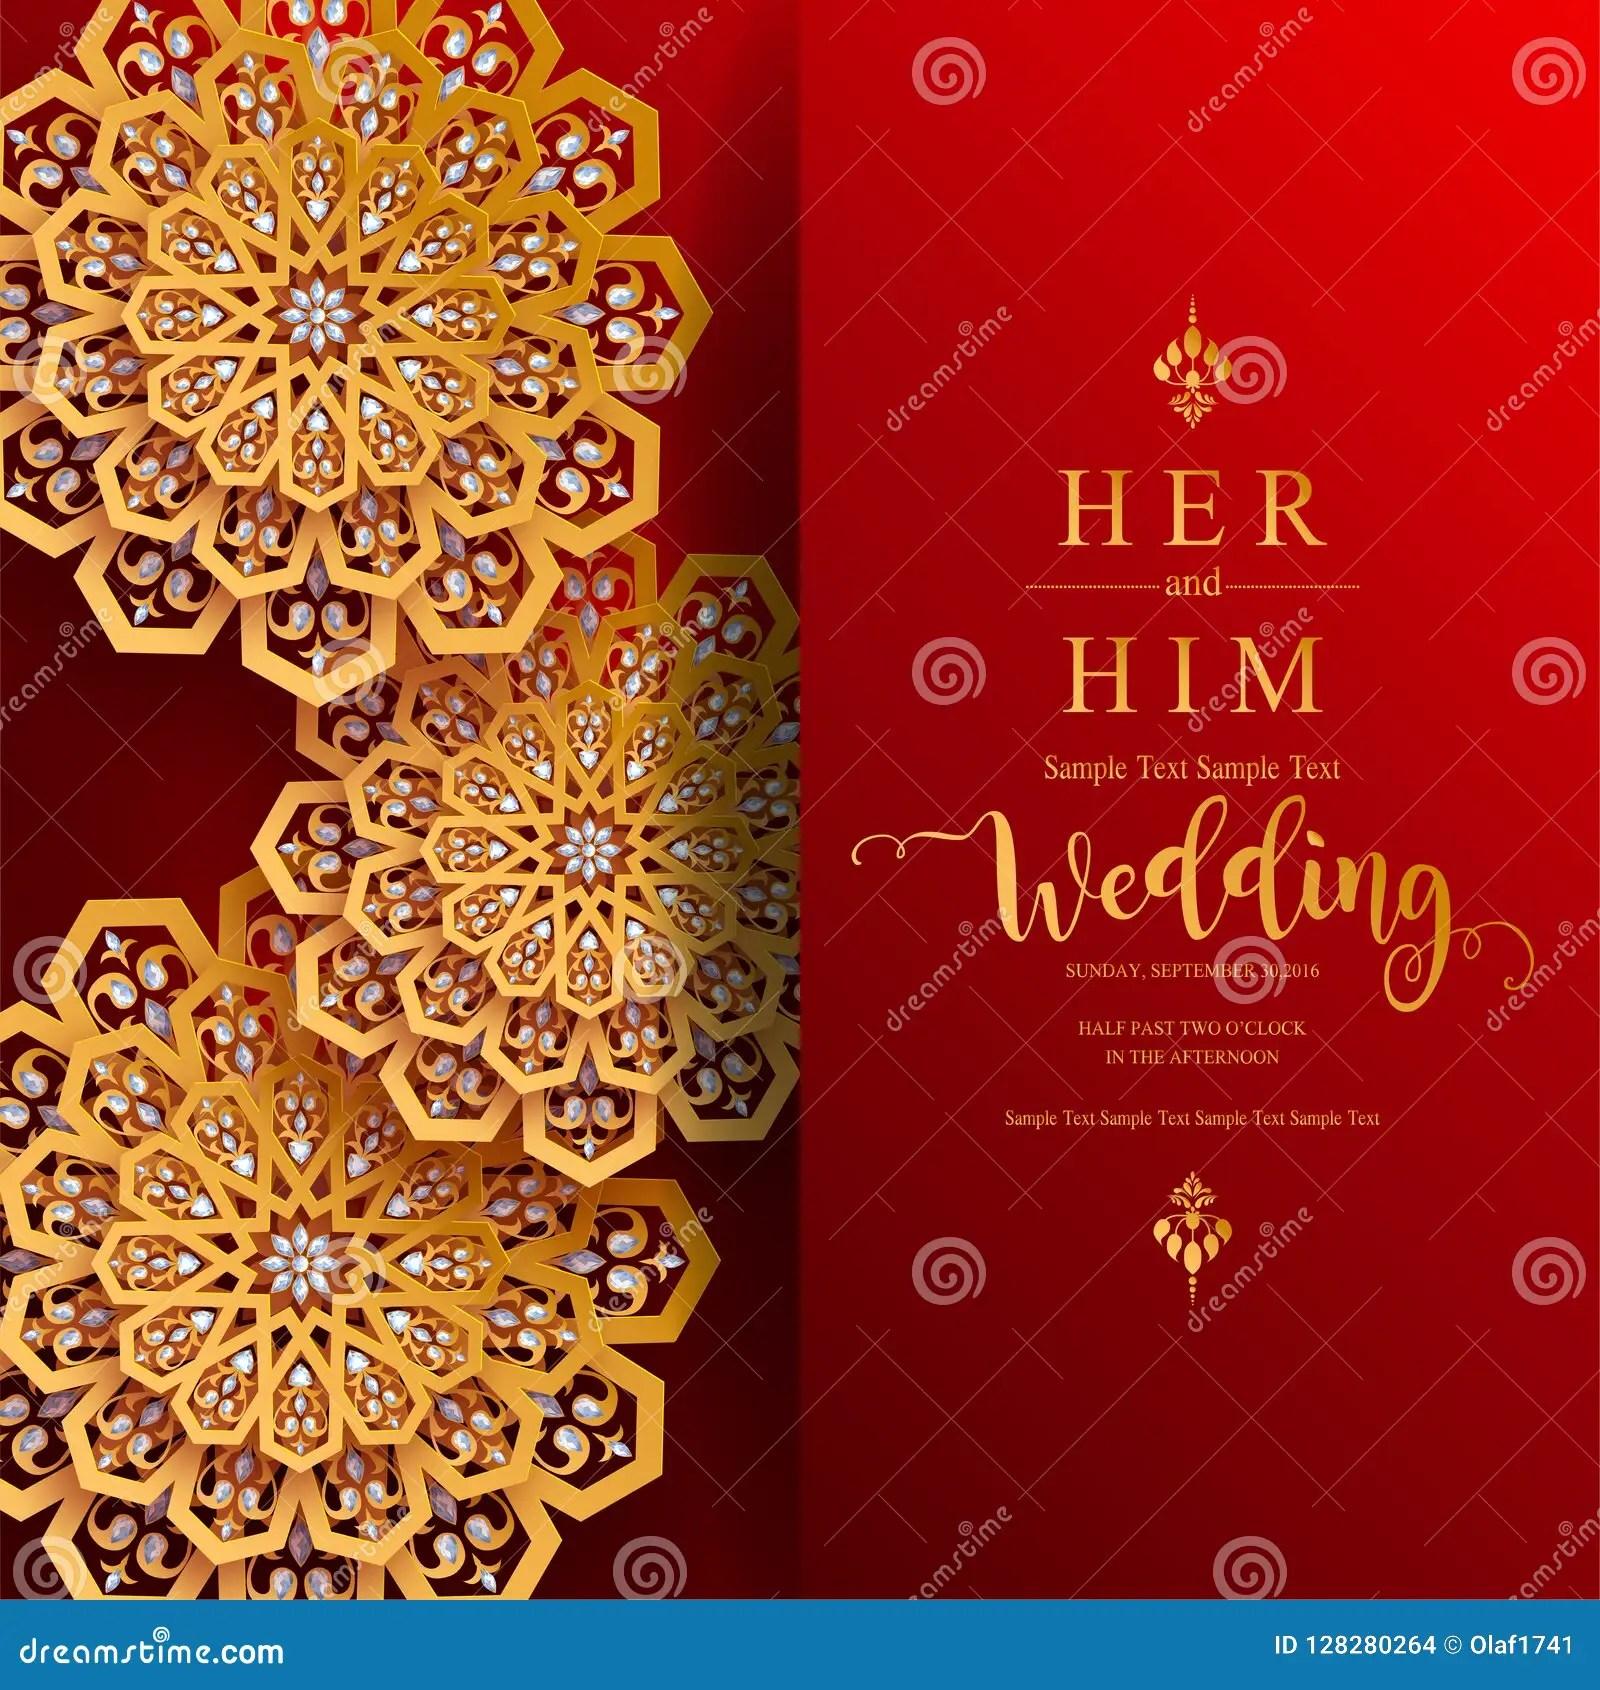 https www dreamstime com inindian wedding invitation carddian wedding invitation card templates gold patterned crystals paper color background image128280264